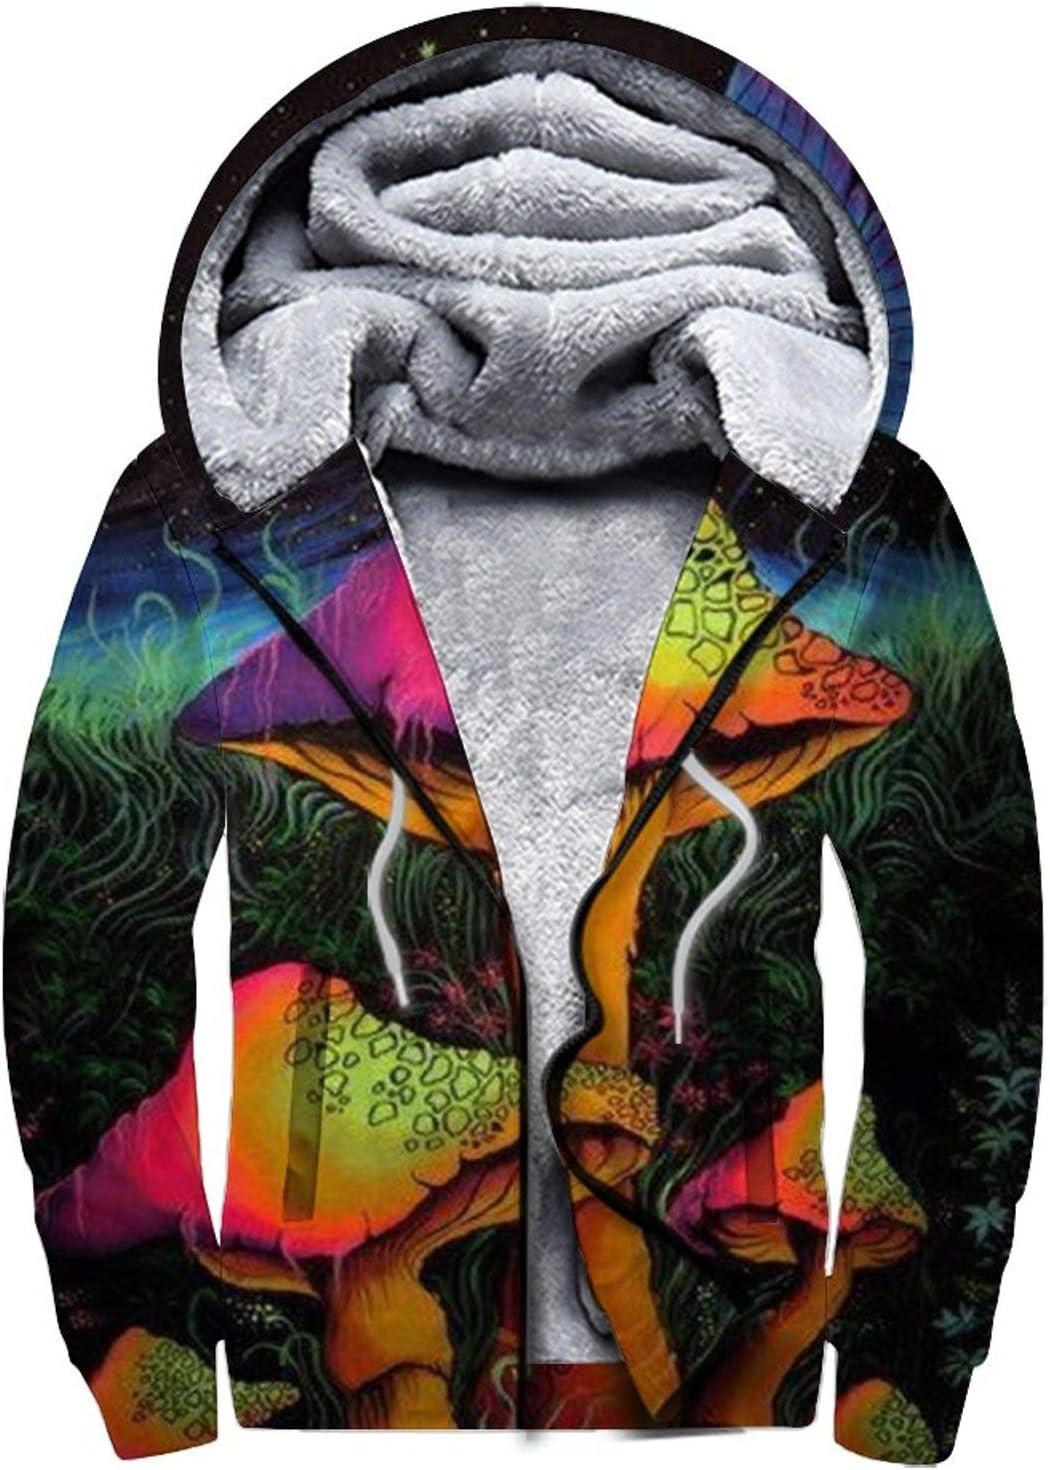 D-WOLVES Men's Super Special SALE held New Orleans Mall Hoodies Pullover Sweatshirt Zip Full Thick Fleec